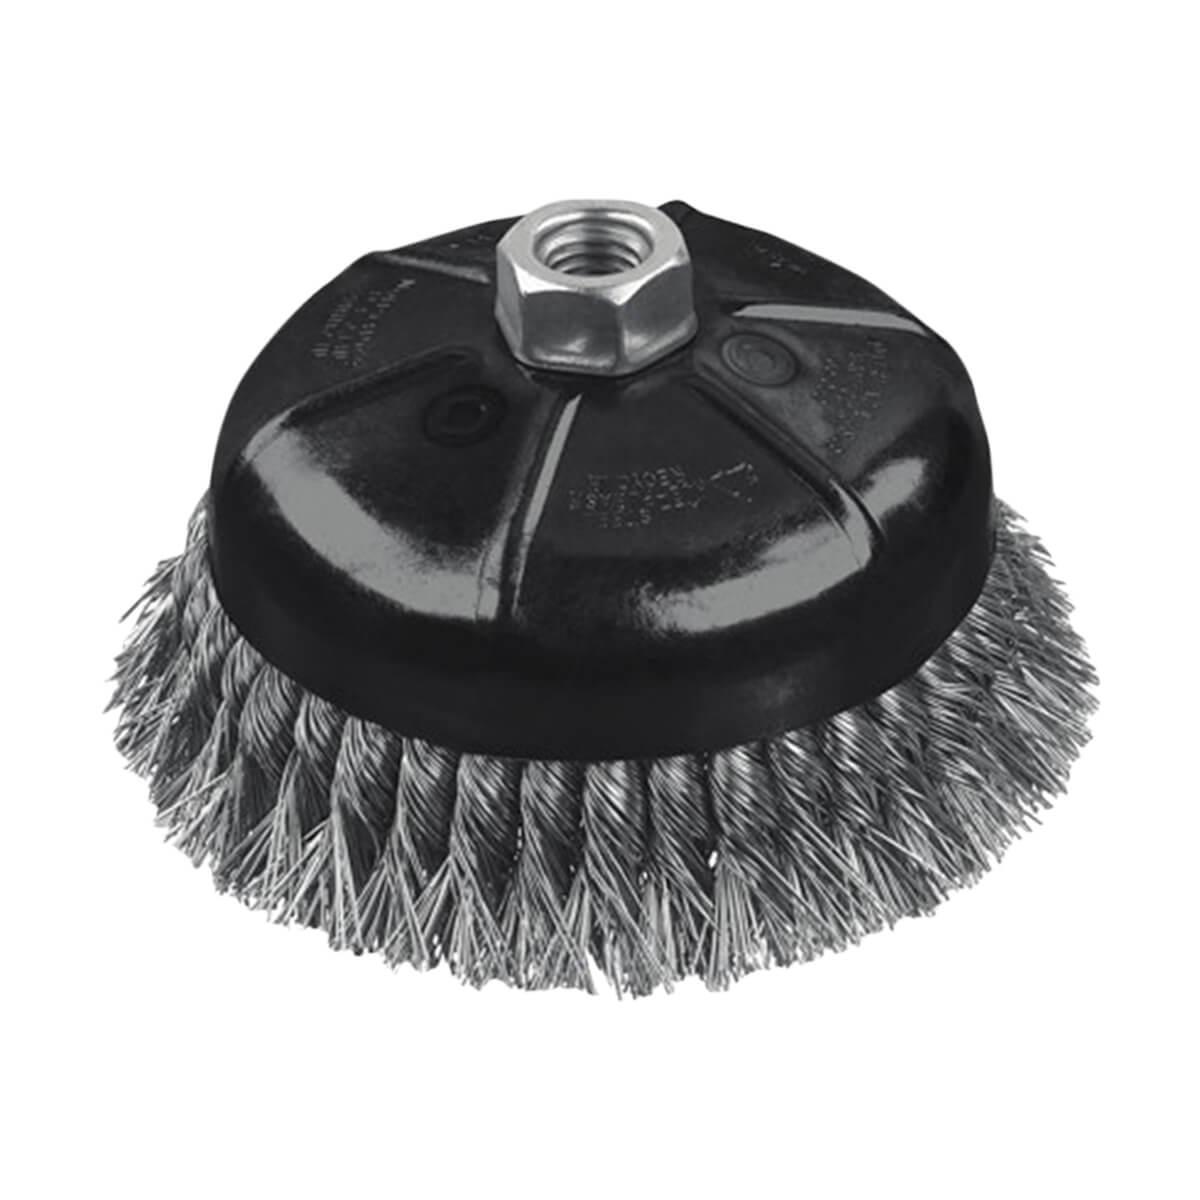 "DEWALT 4"" Knotted Cup Brush/Carbon Steel 5/8"" - 11 Arbor .020"" - DW4916"